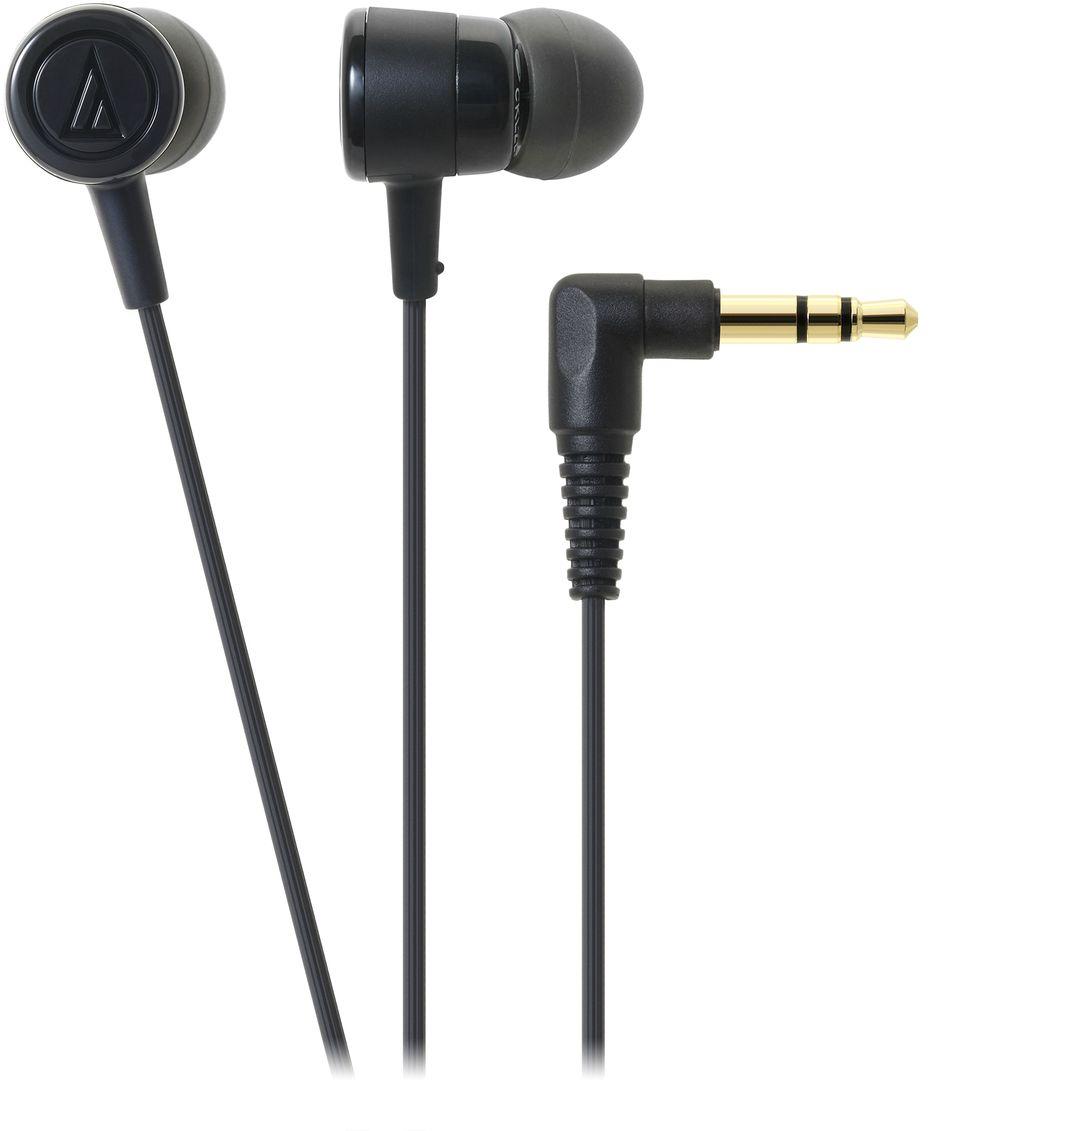 все цены на Audio-Technica ATH-CKL220, Black наушники онлайн